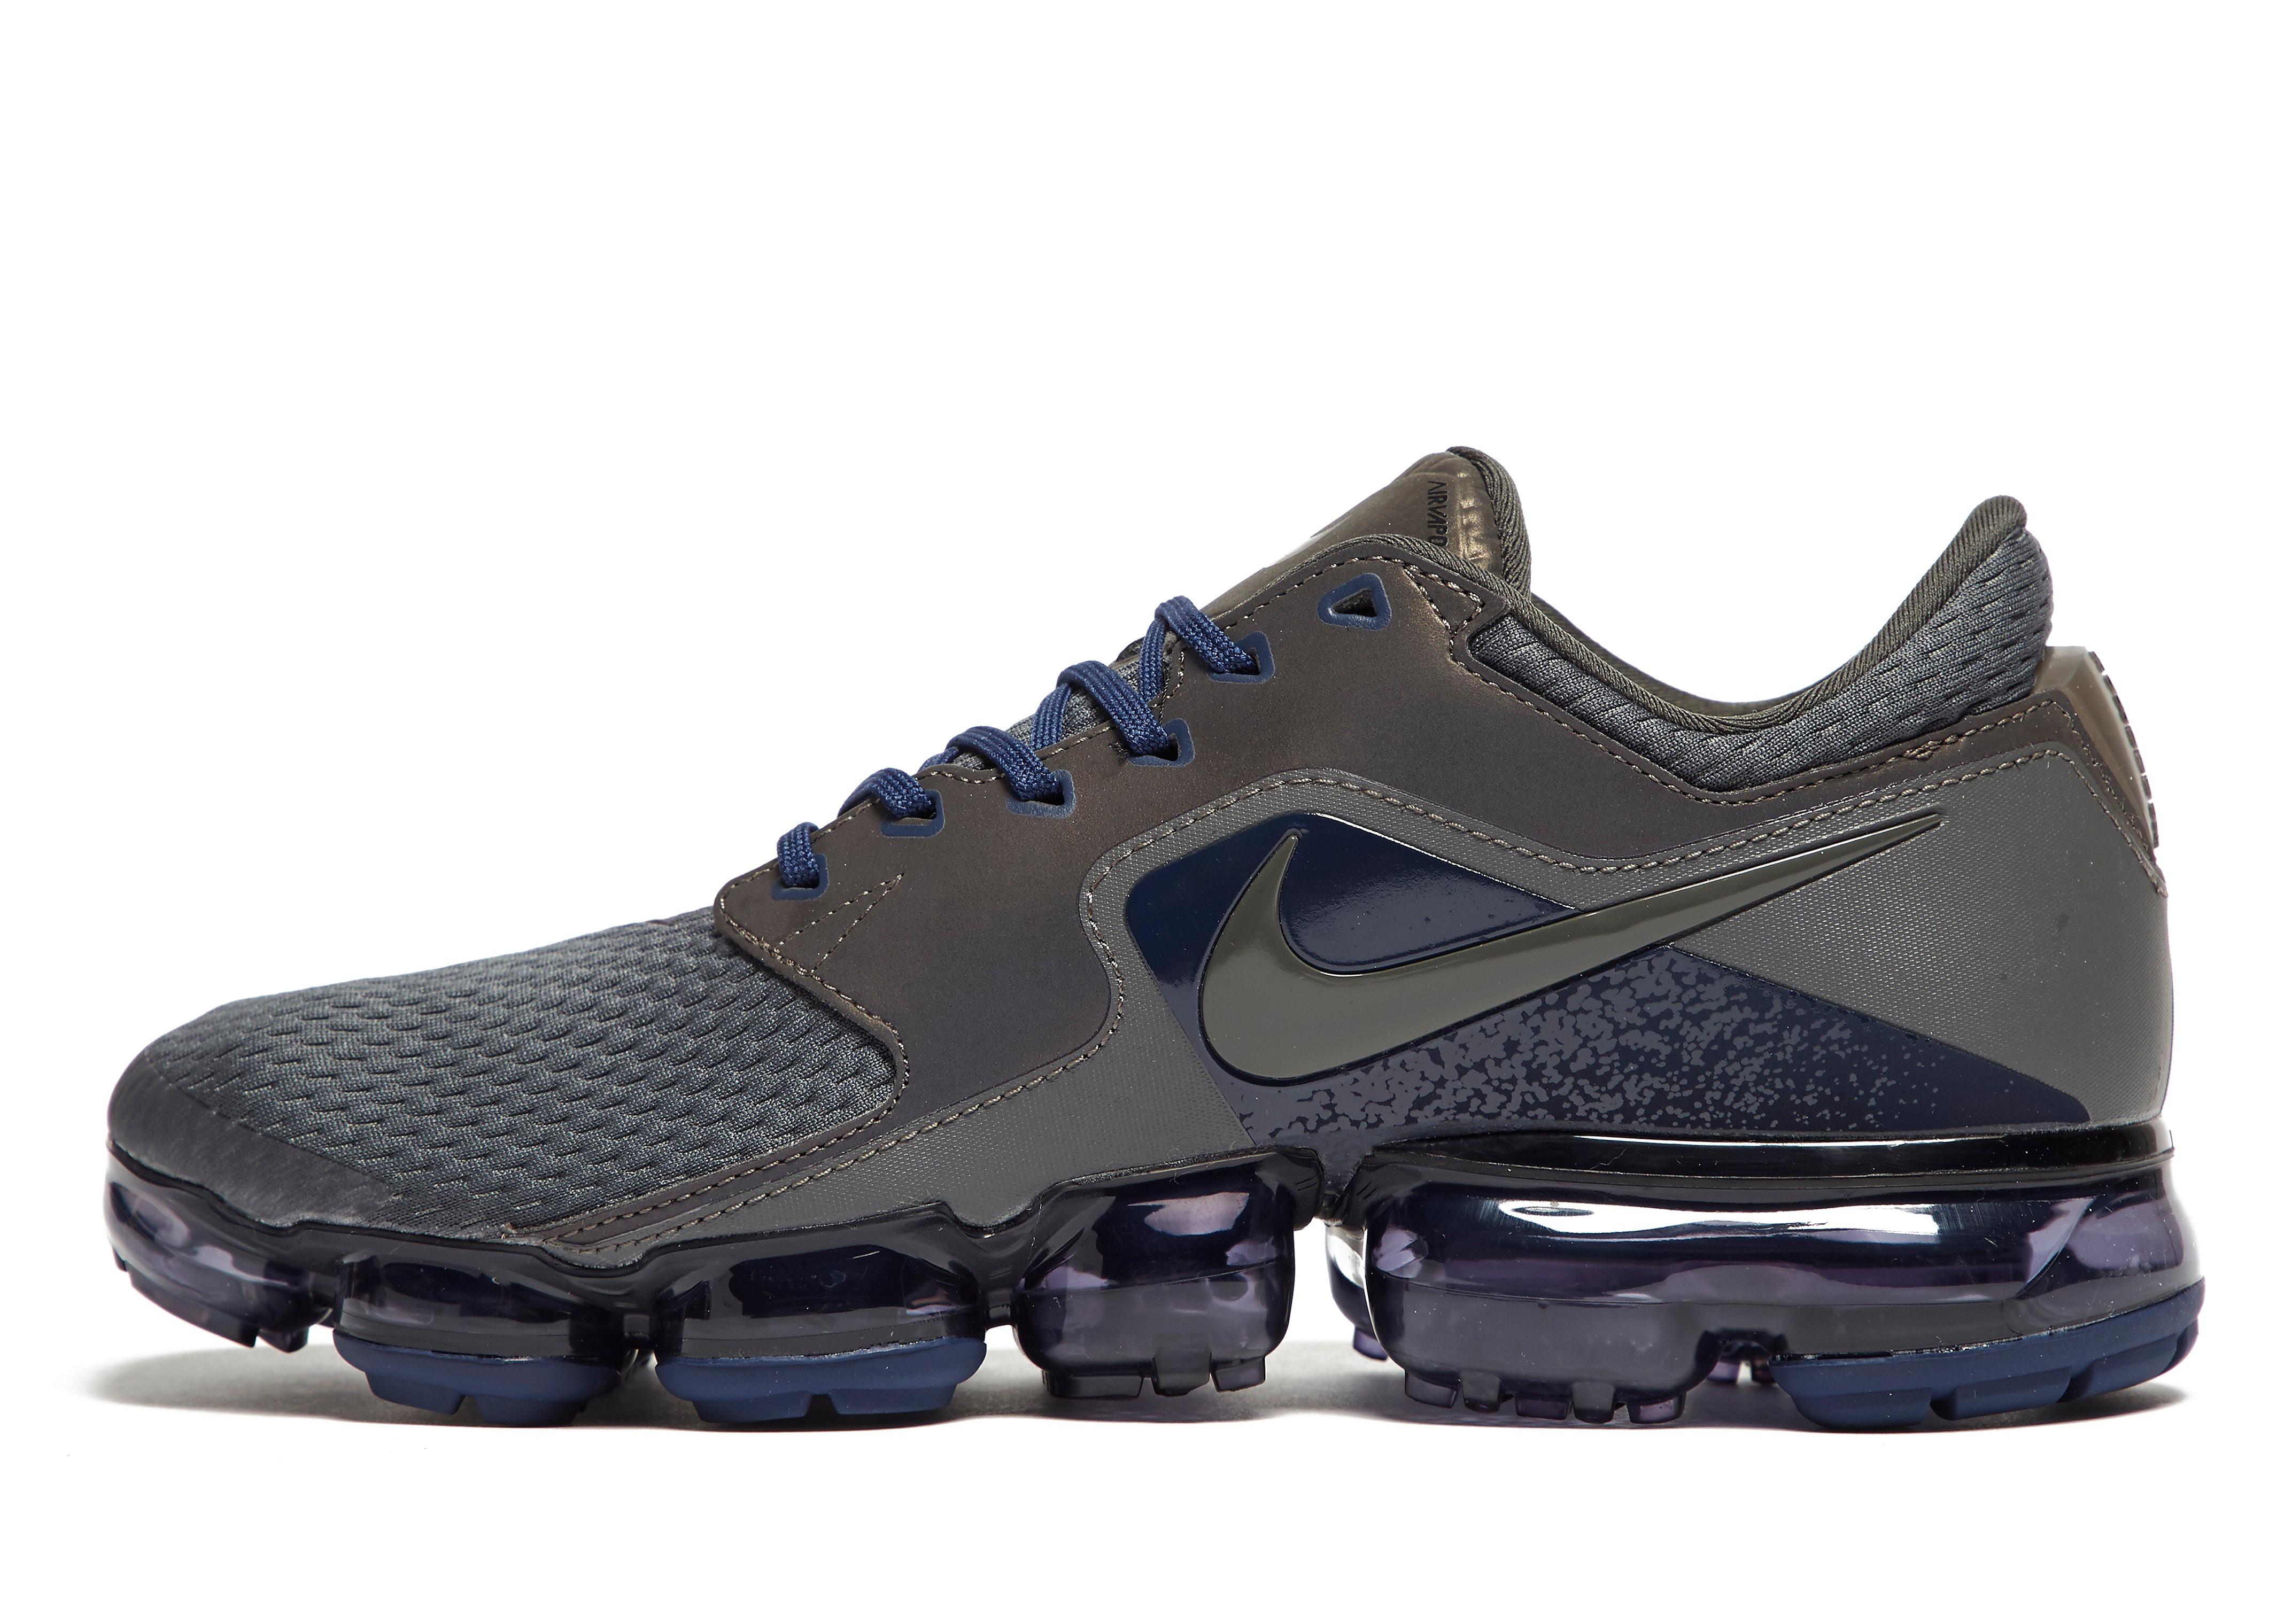 Nike Air VaporMax, Mightnight Fog